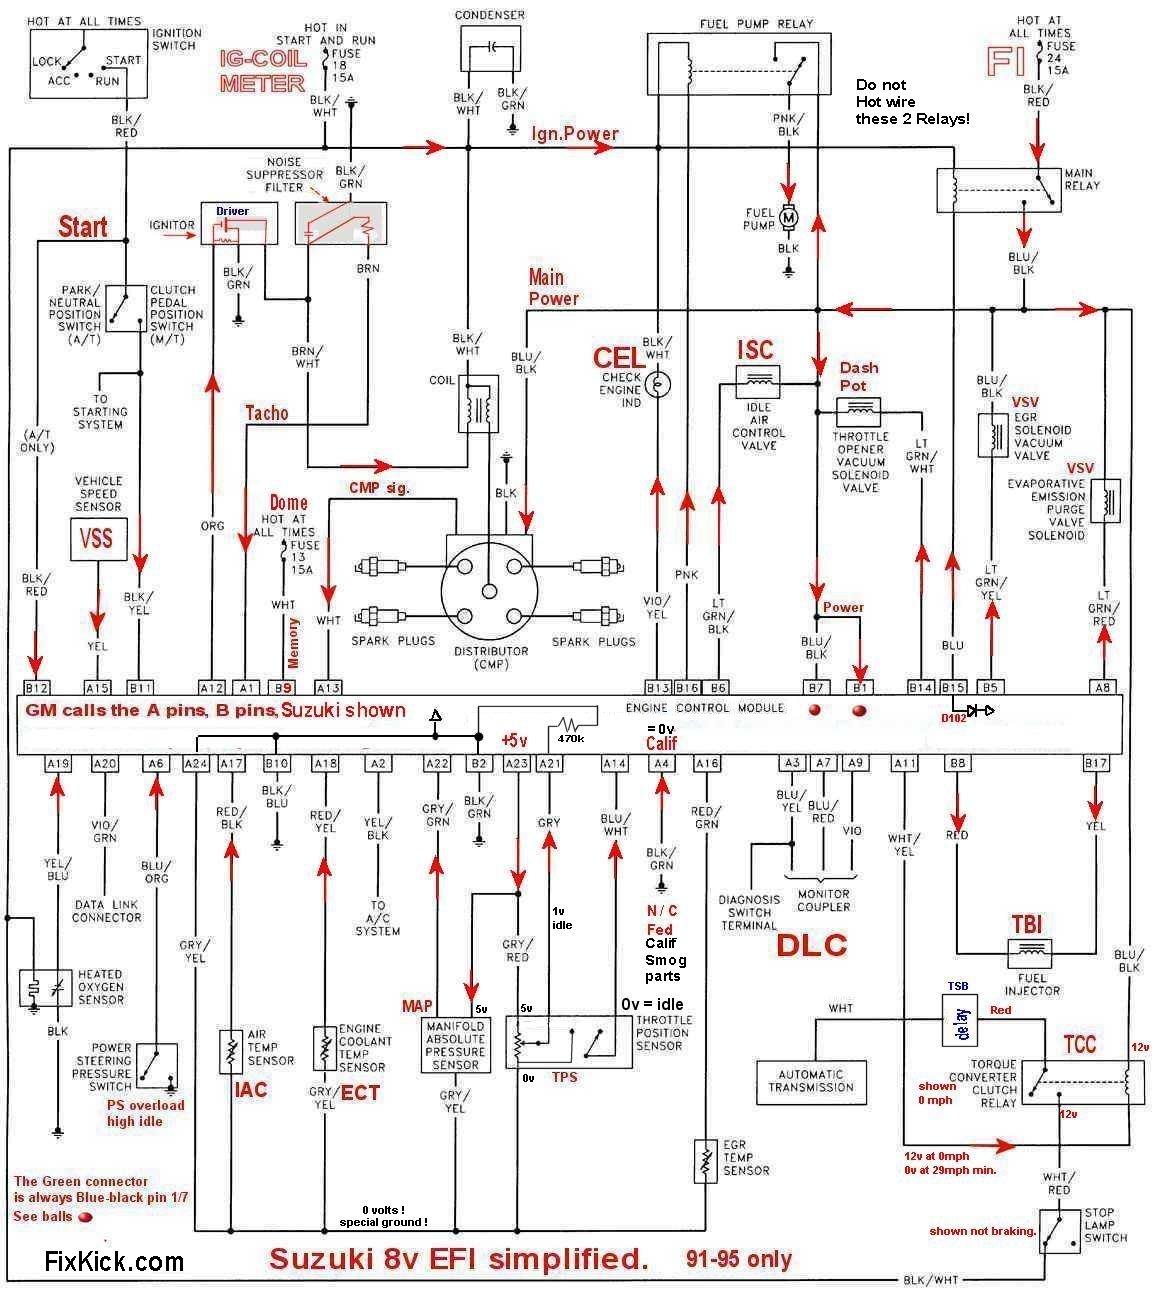 Excellent Dodge Ecu Wiring Diagram Wiring Library Wiring Cloud Dulfrecoveryedborg